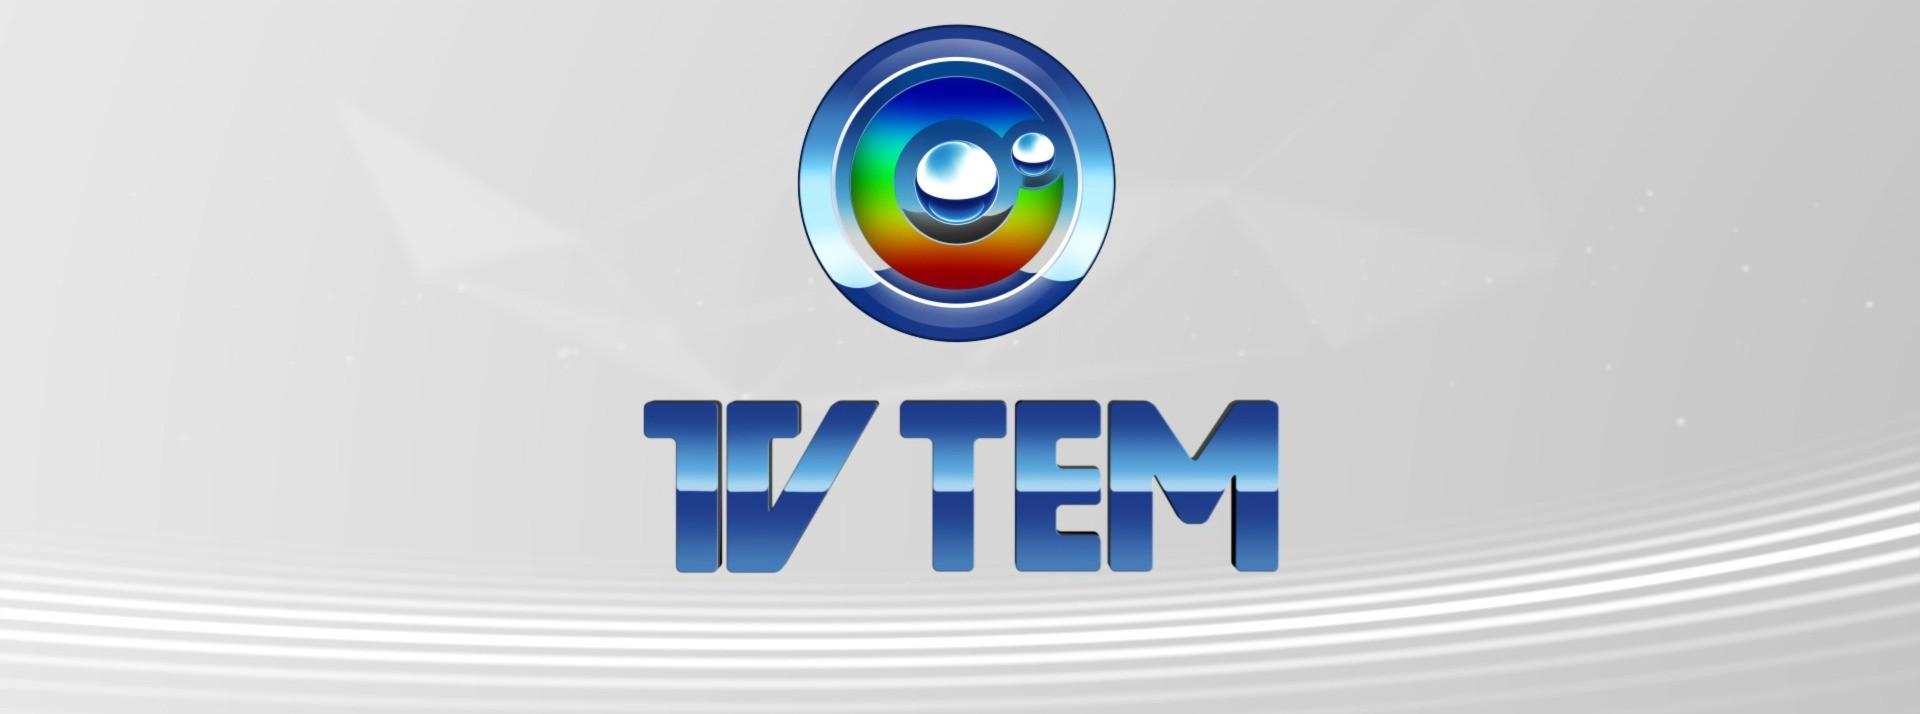 TV TEM identidade 2014 (Foto: Arte/TVTEM)